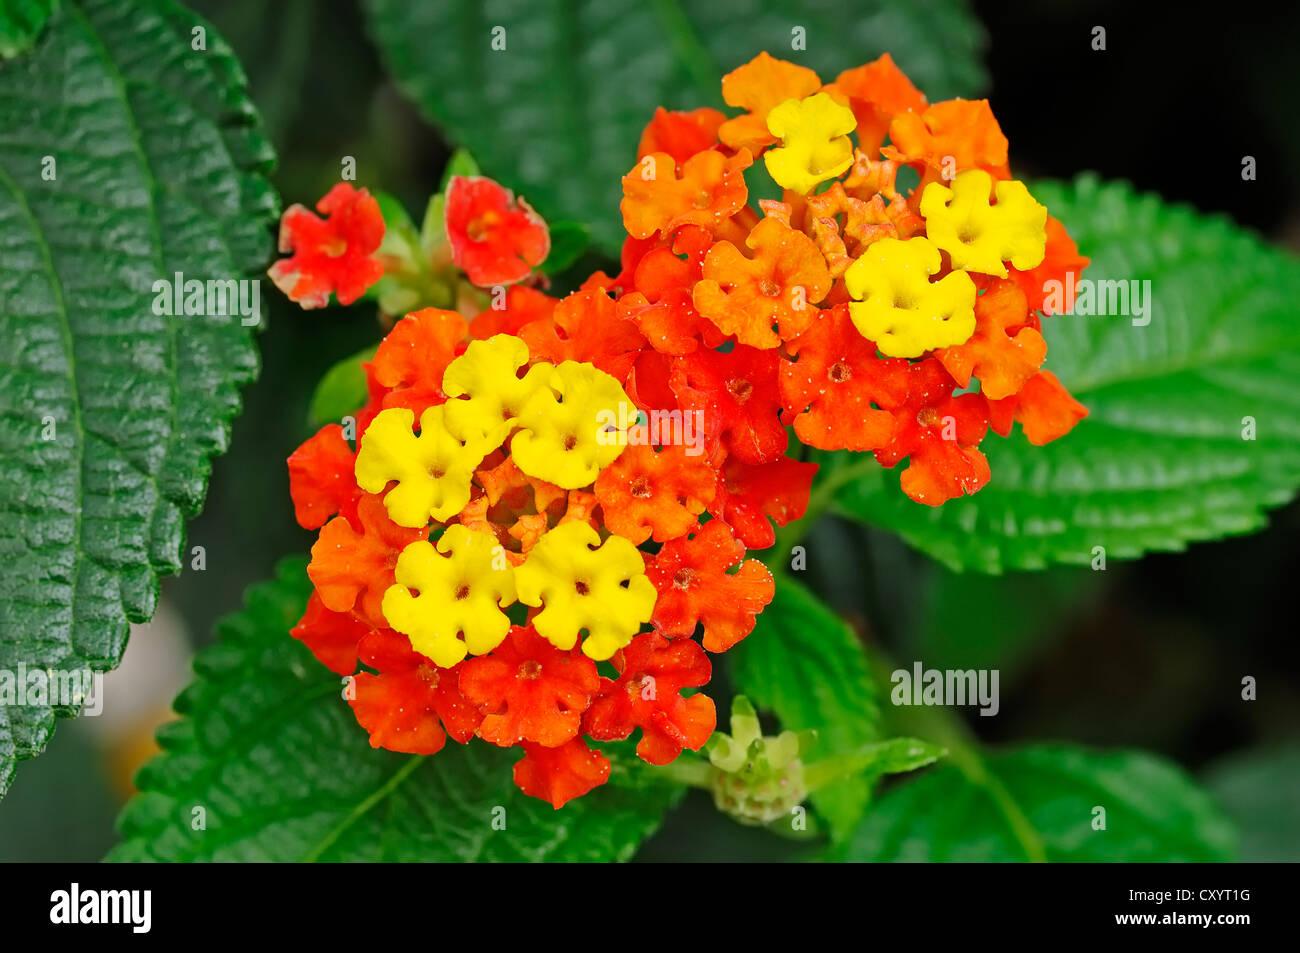 Spanish Flag or West Indian Lantana Lantana camara flowers Stock Ro